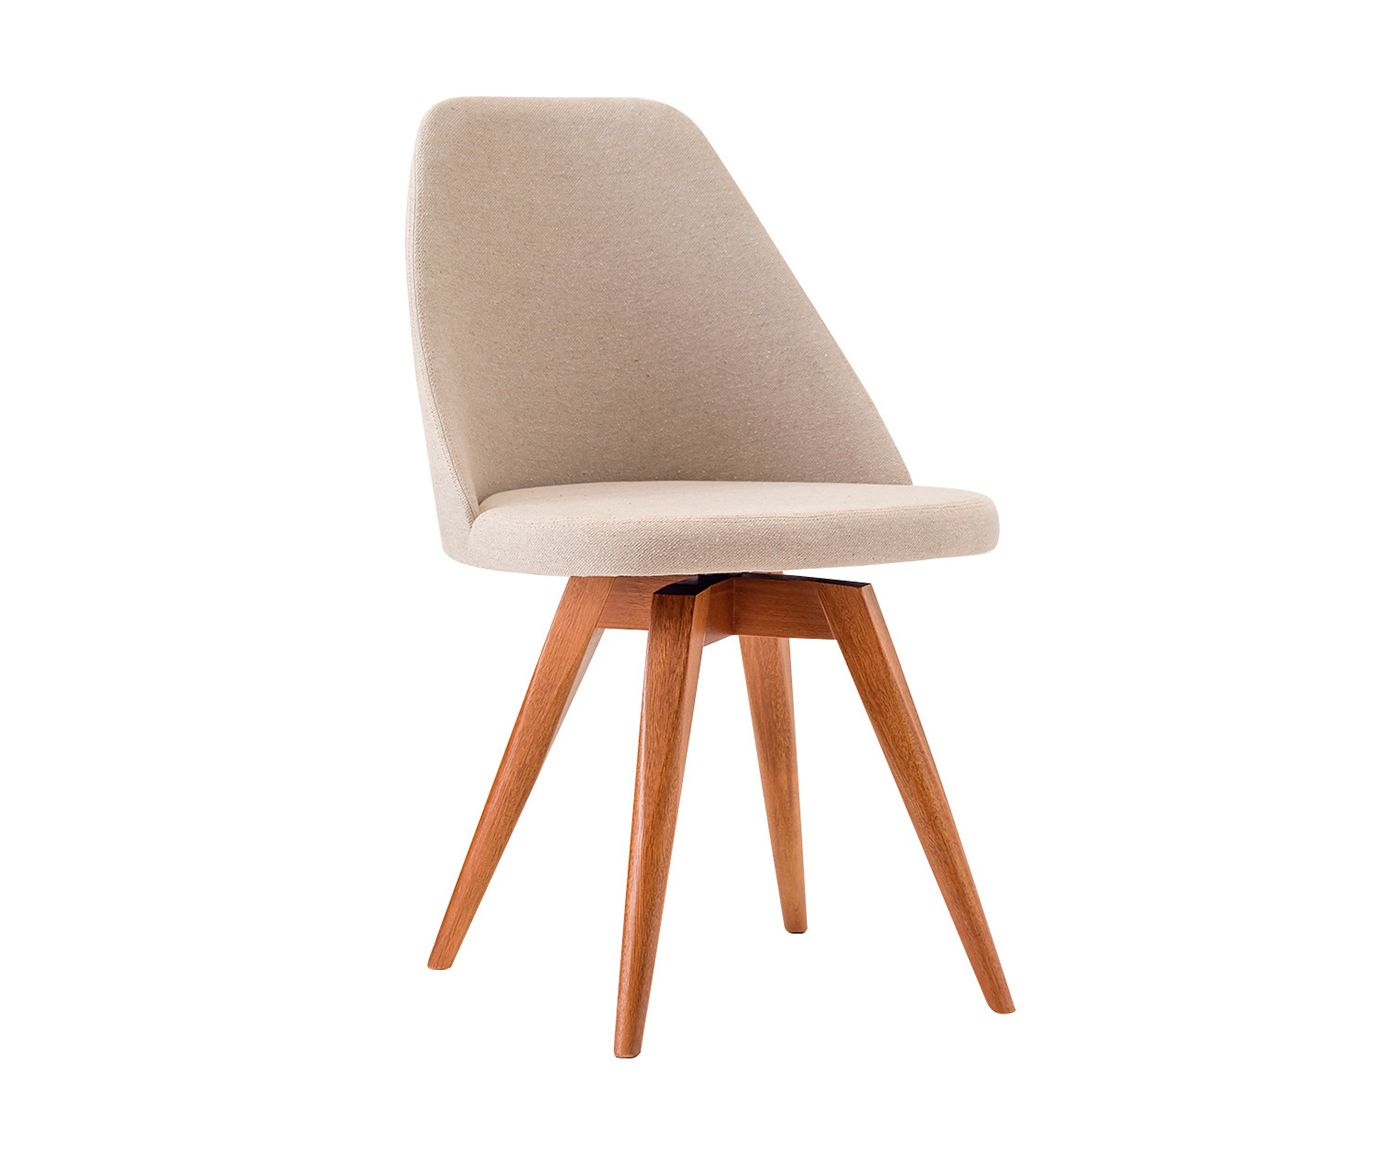 Cadeira Fixa Lucy Bege Médio - 53X86X55cm | Westwing.com.br